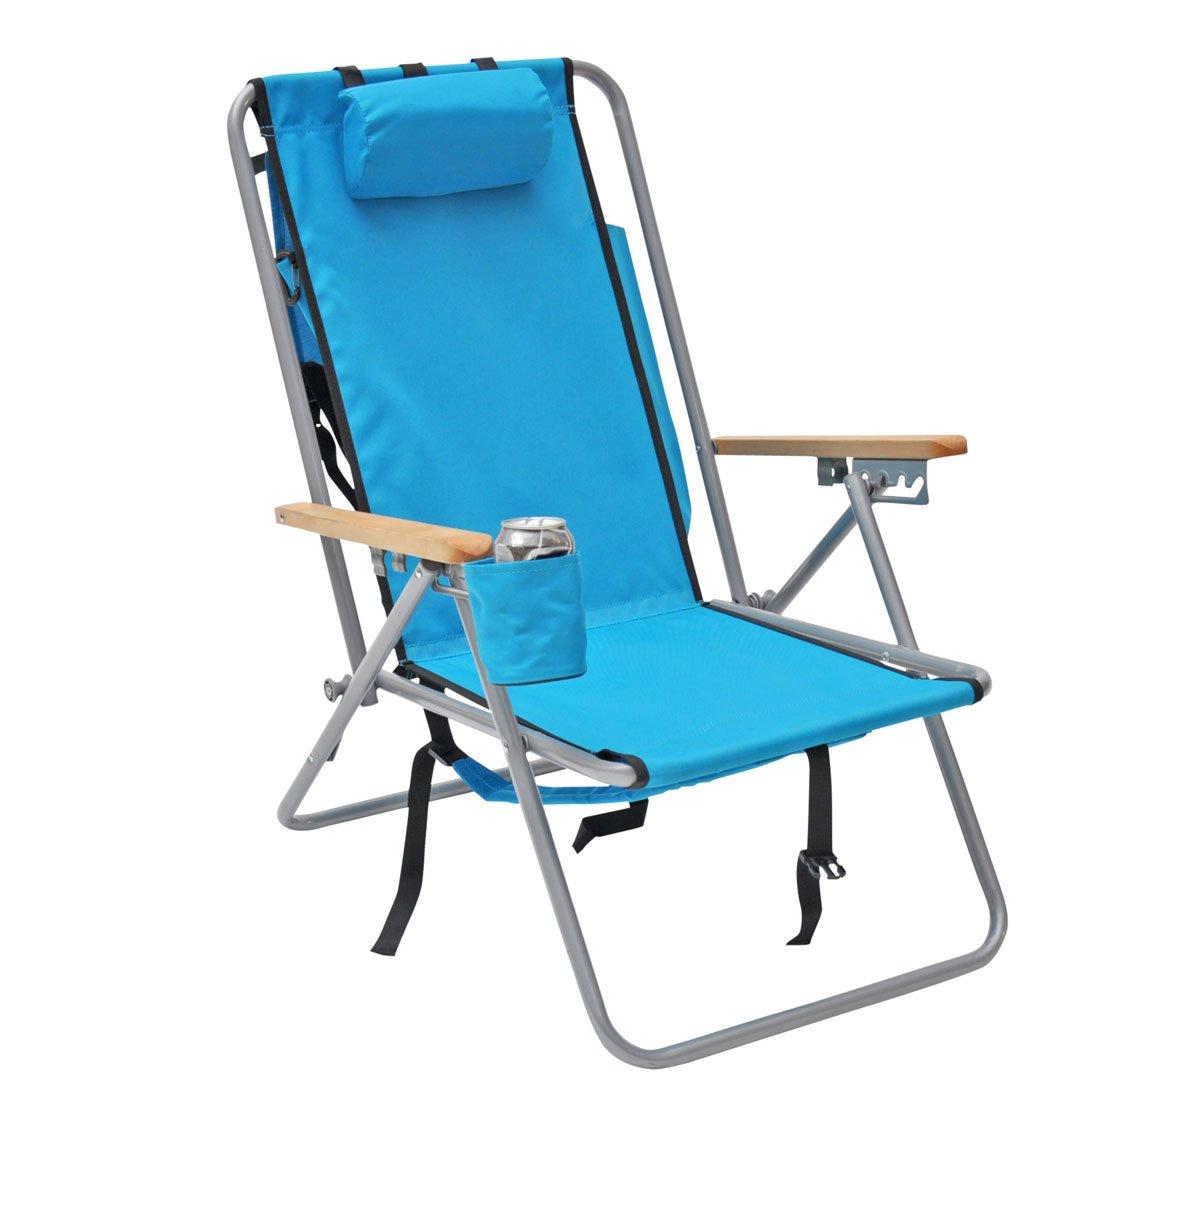 Wearever backpack chair - Amazon Com High Back Steel Backpack Beach Chair By Wearever Aruba Blue Sports Outdoors